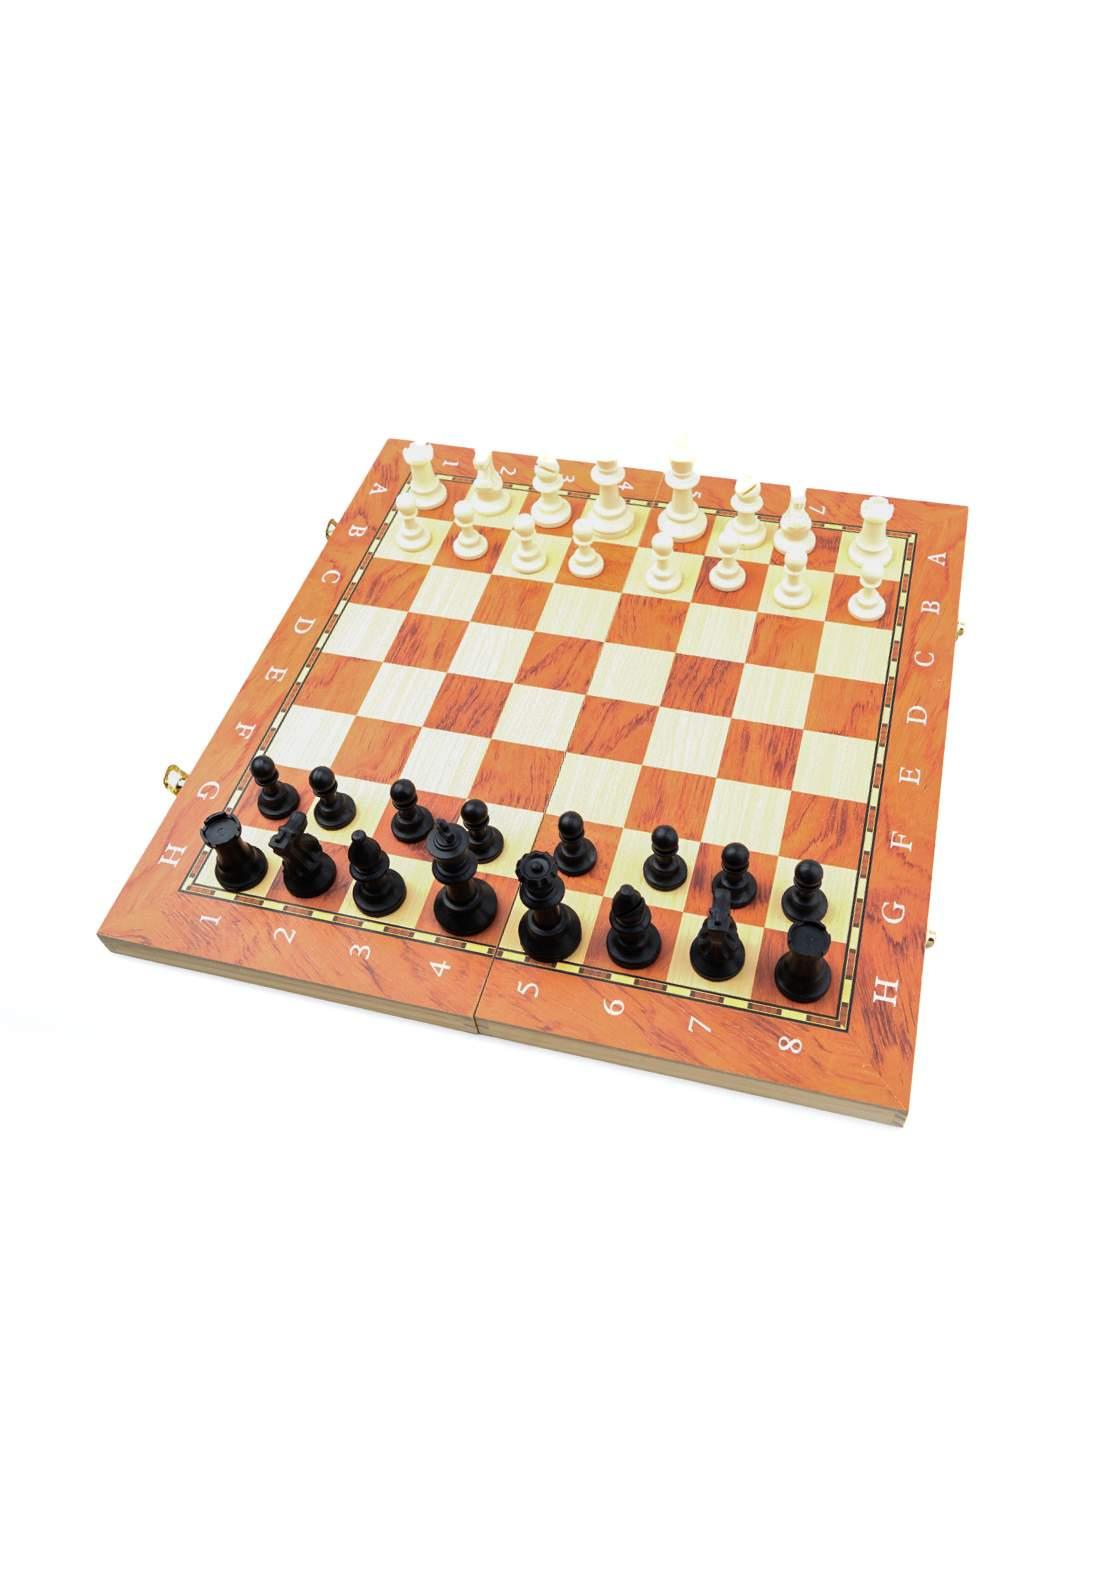 Foldable Wooden Chess Set مجموعة لوح الشطرنج الخشبي